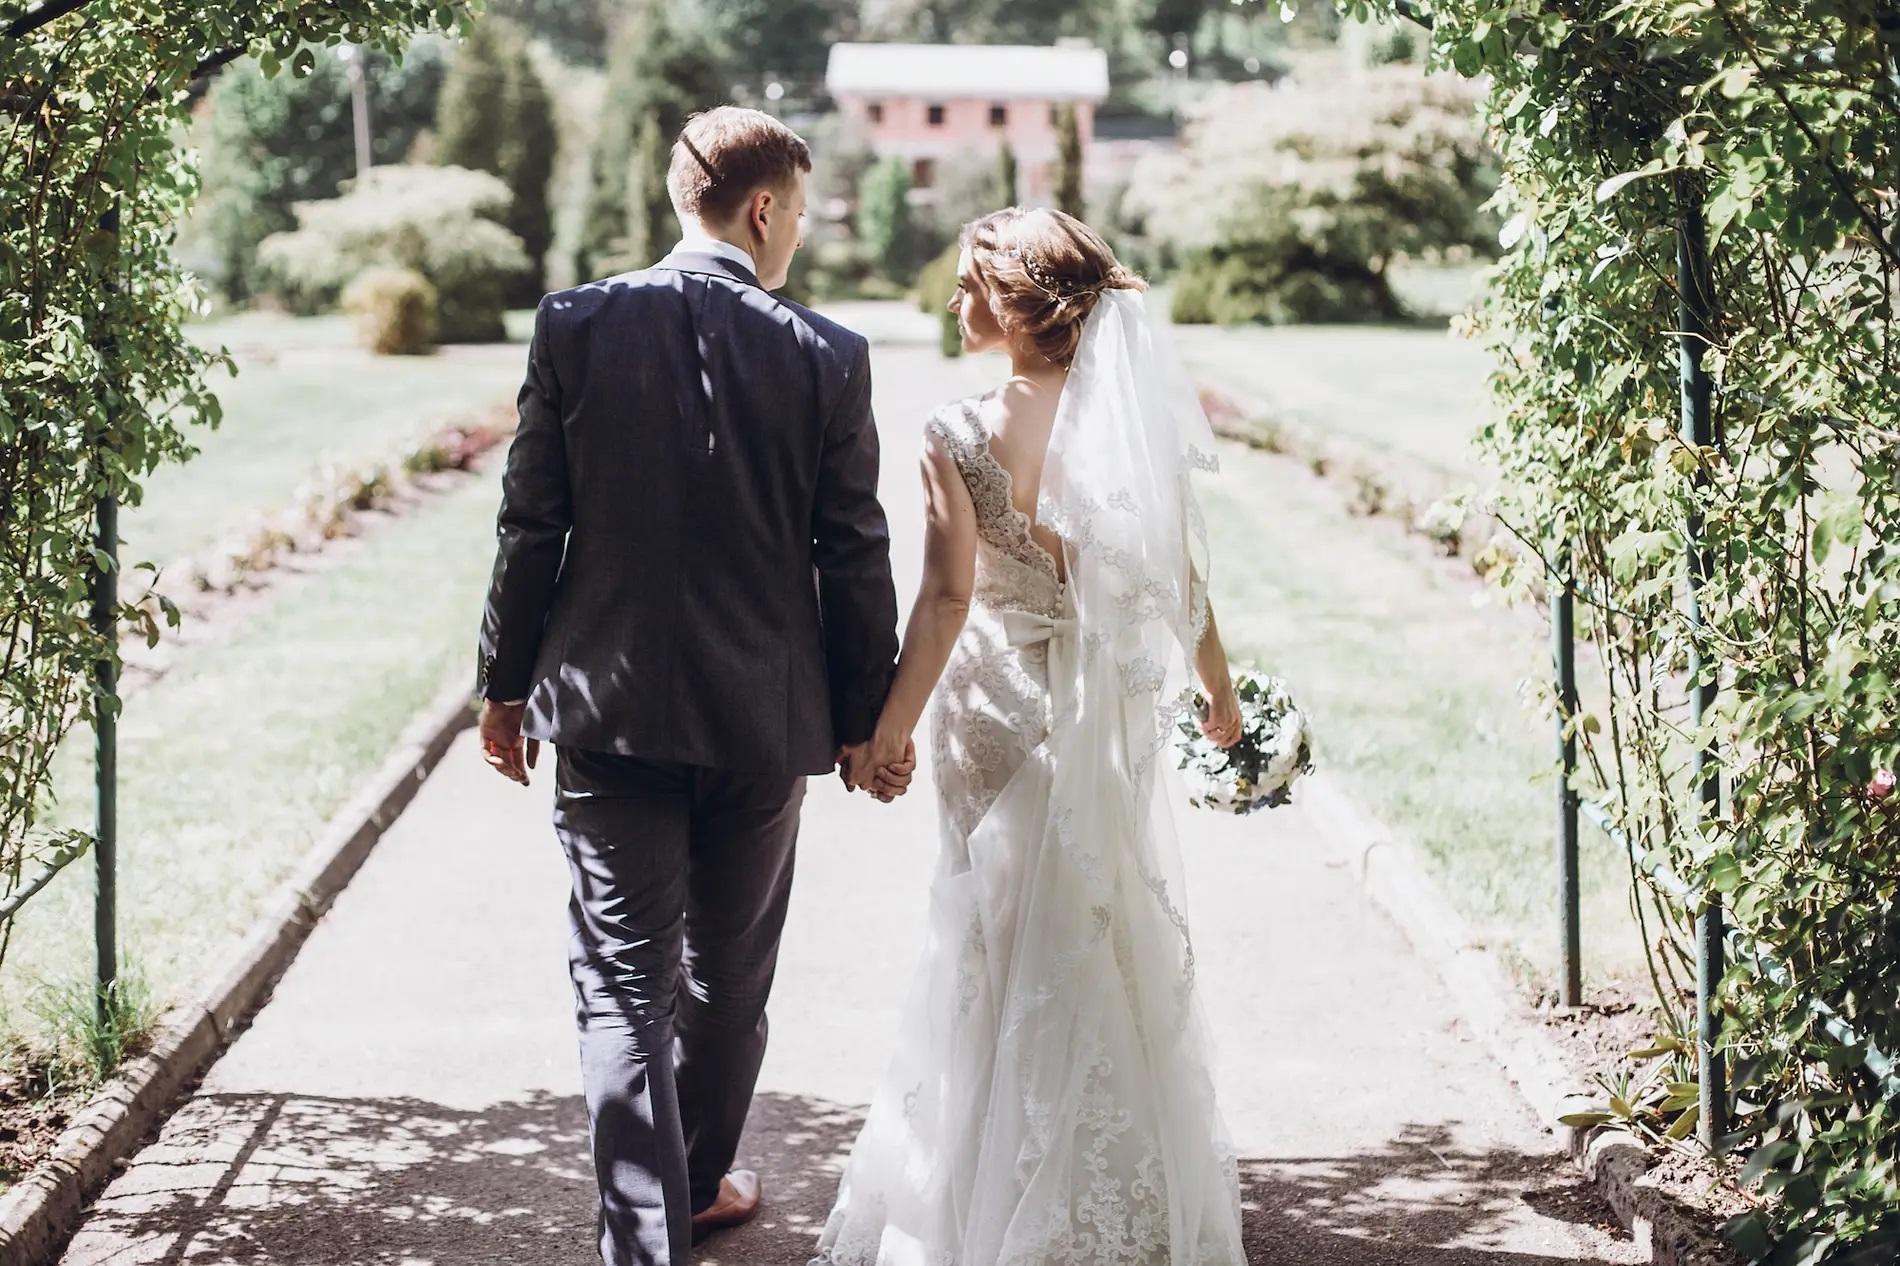 wesela a koronawirus, ślub a epidemia koronawirusa w Polsce